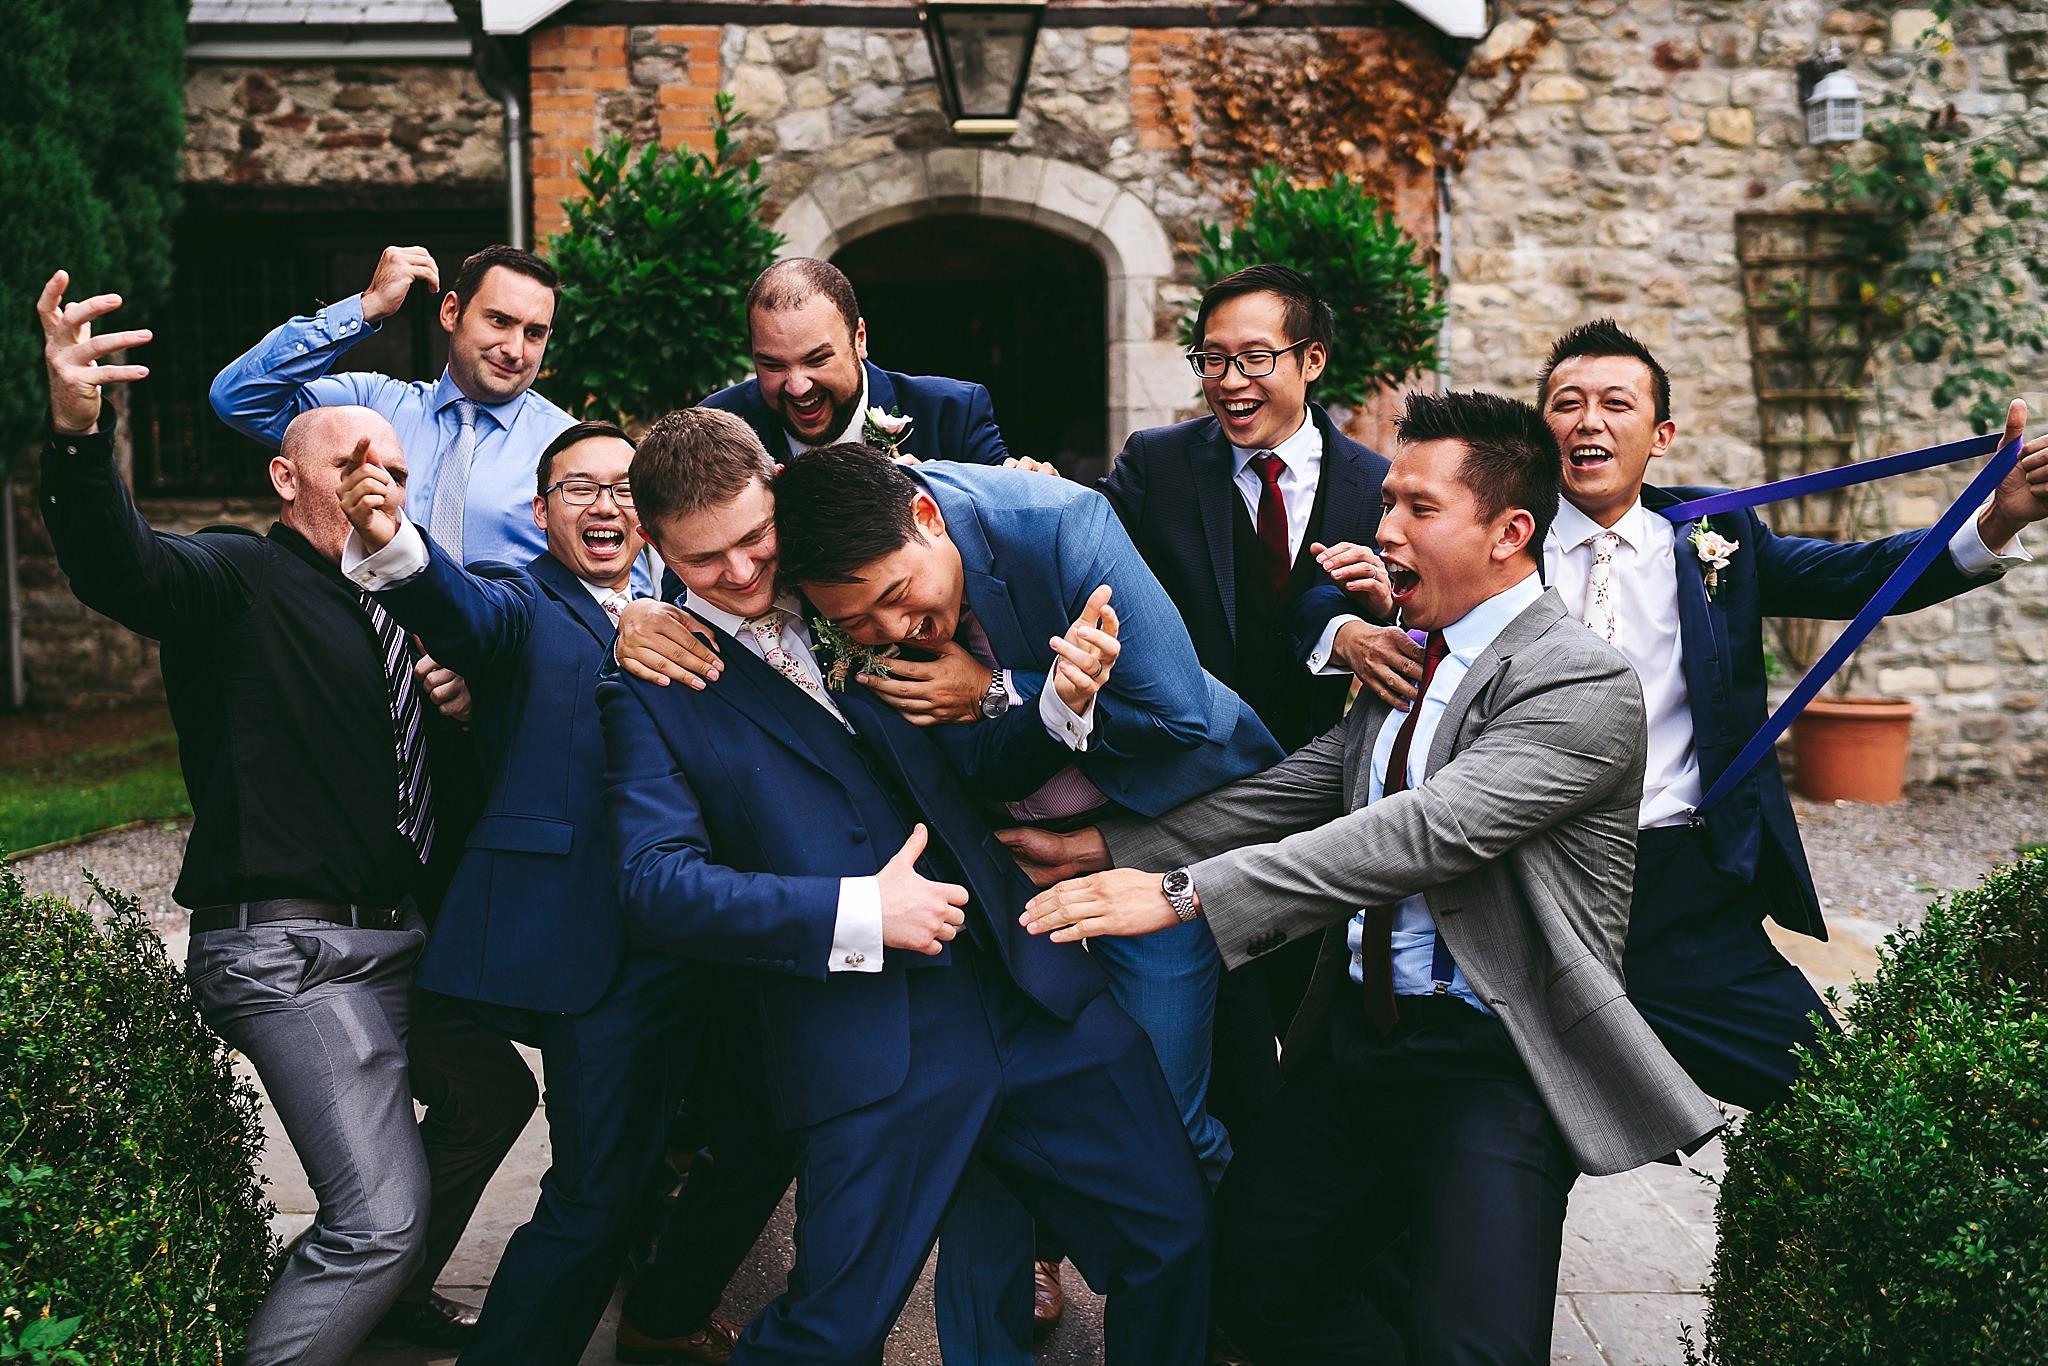 aga-tomaszek-wedding-photographer-cardiff-2016_1051